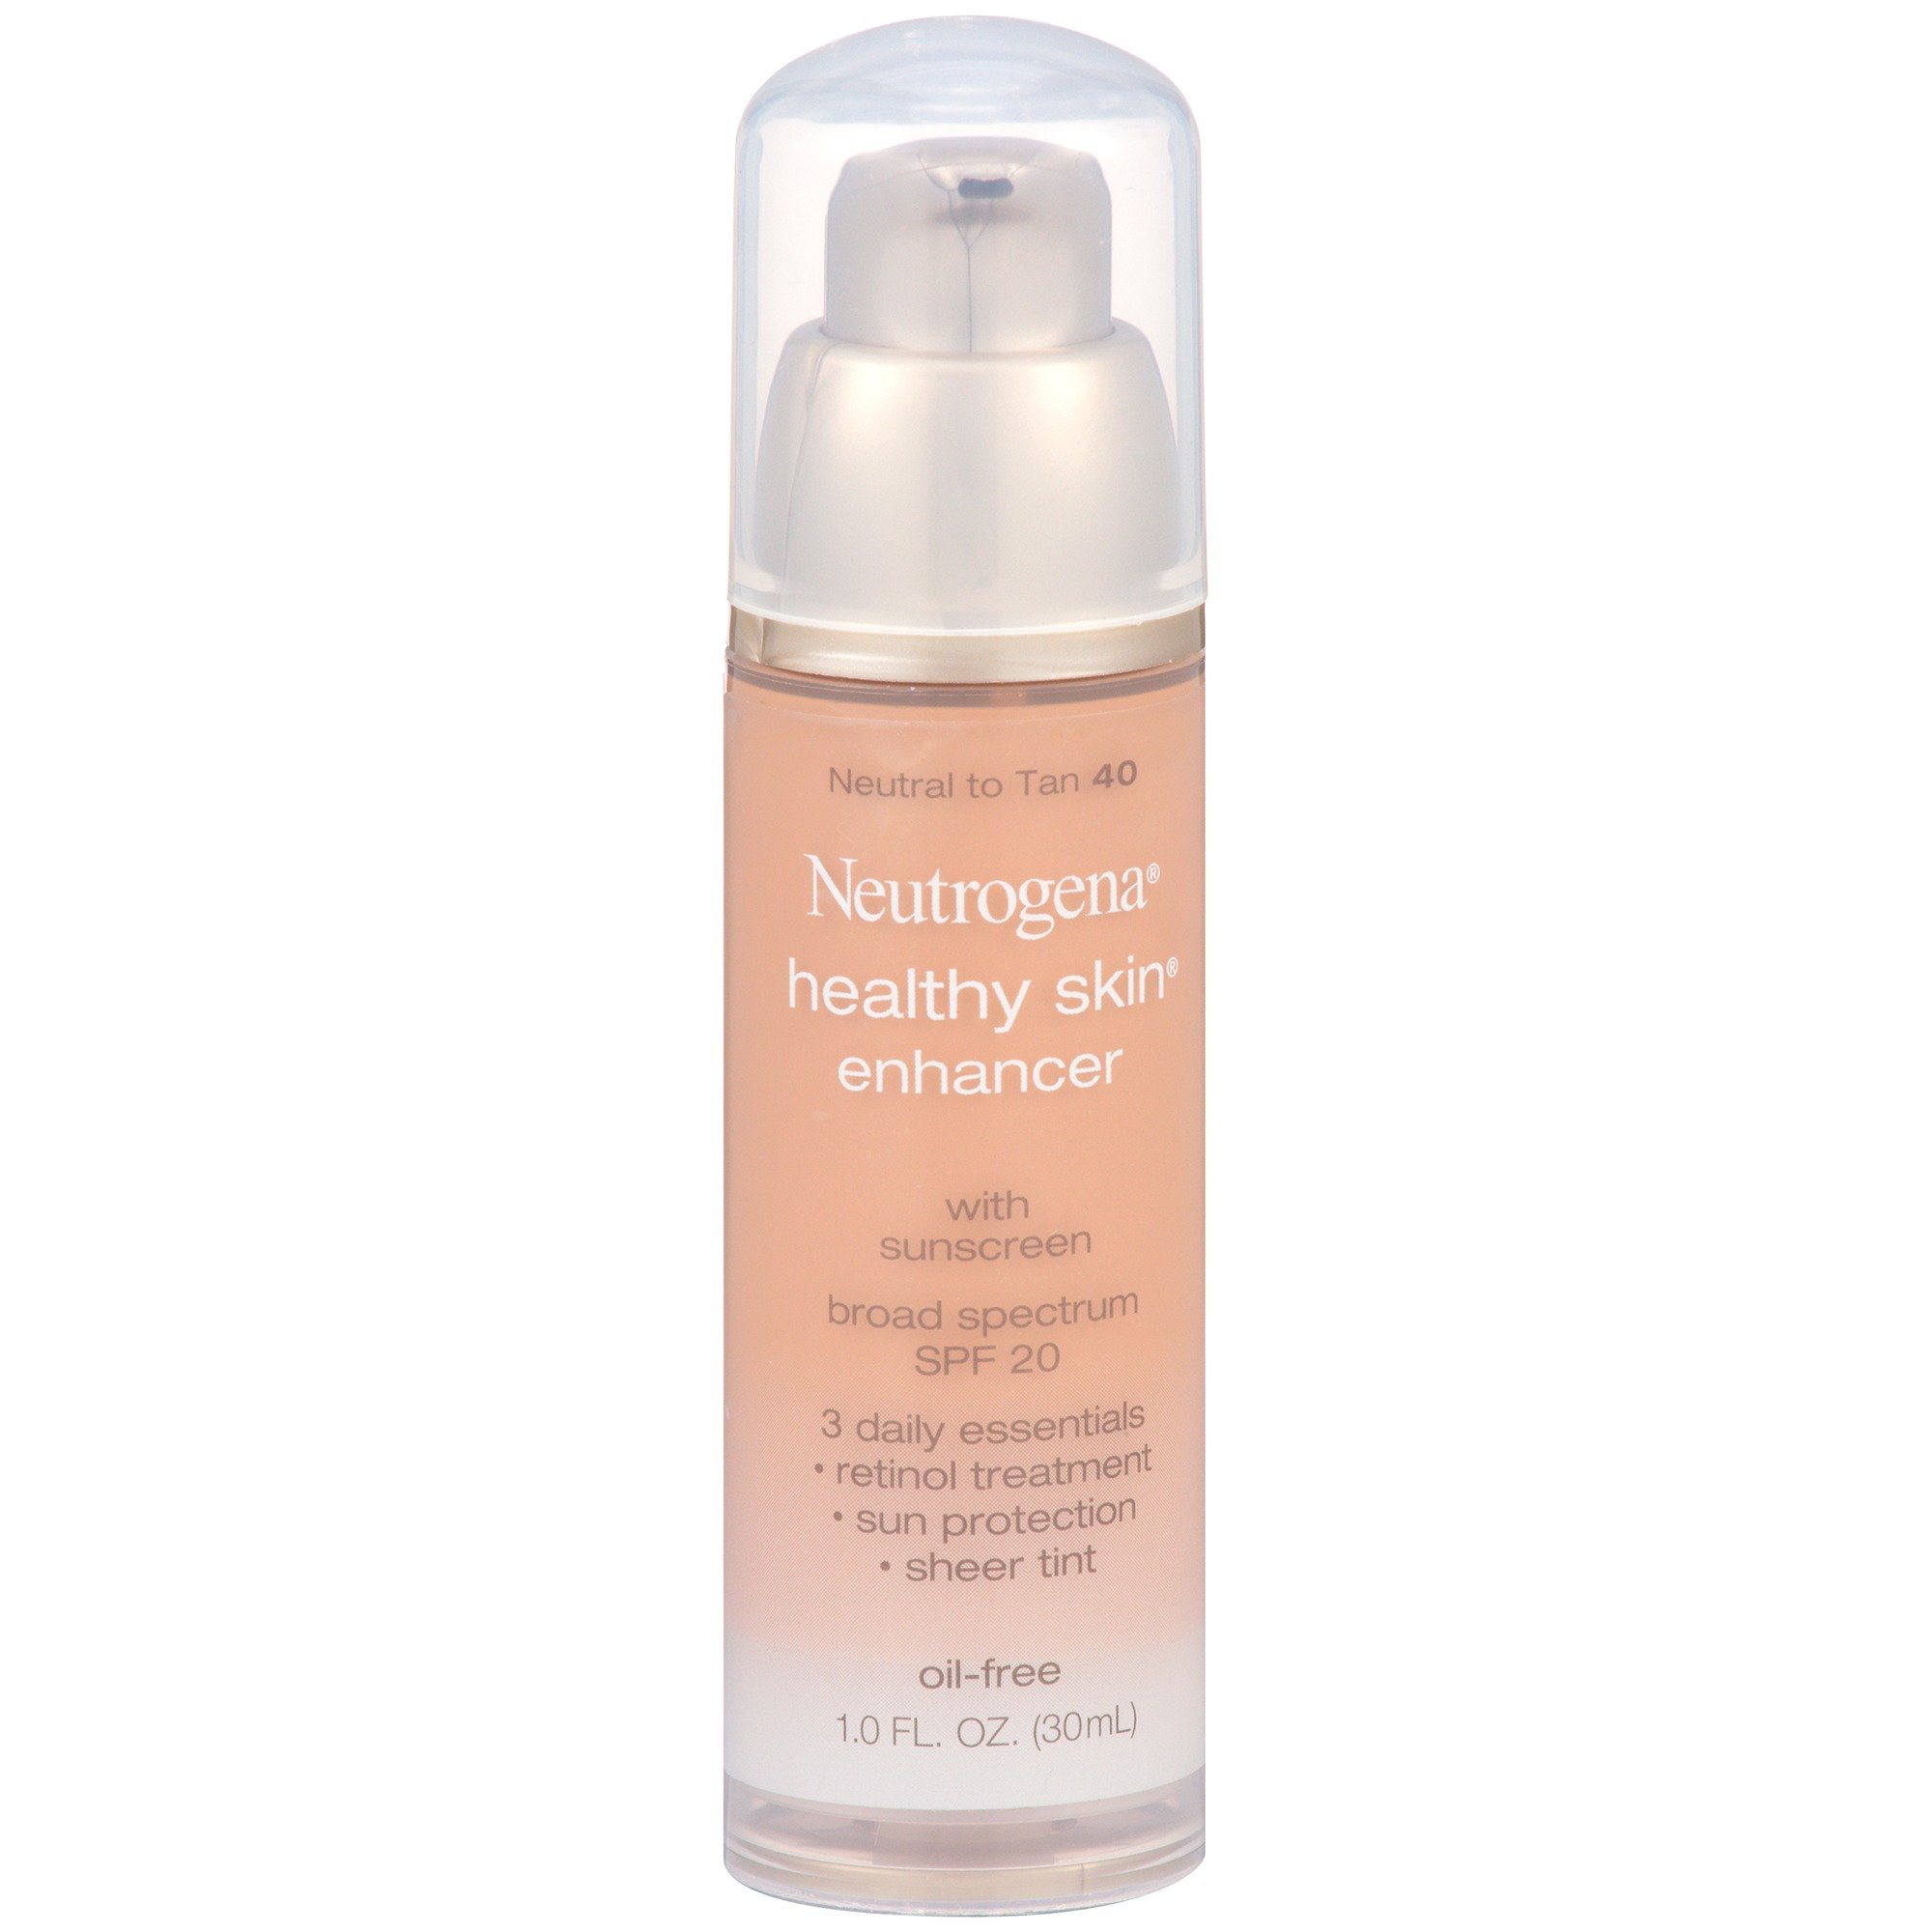 Neutrogena Healthy Skin Enhancer Broad Spectrum Spf 20, Neutral To Tan 40, 1 Oz.